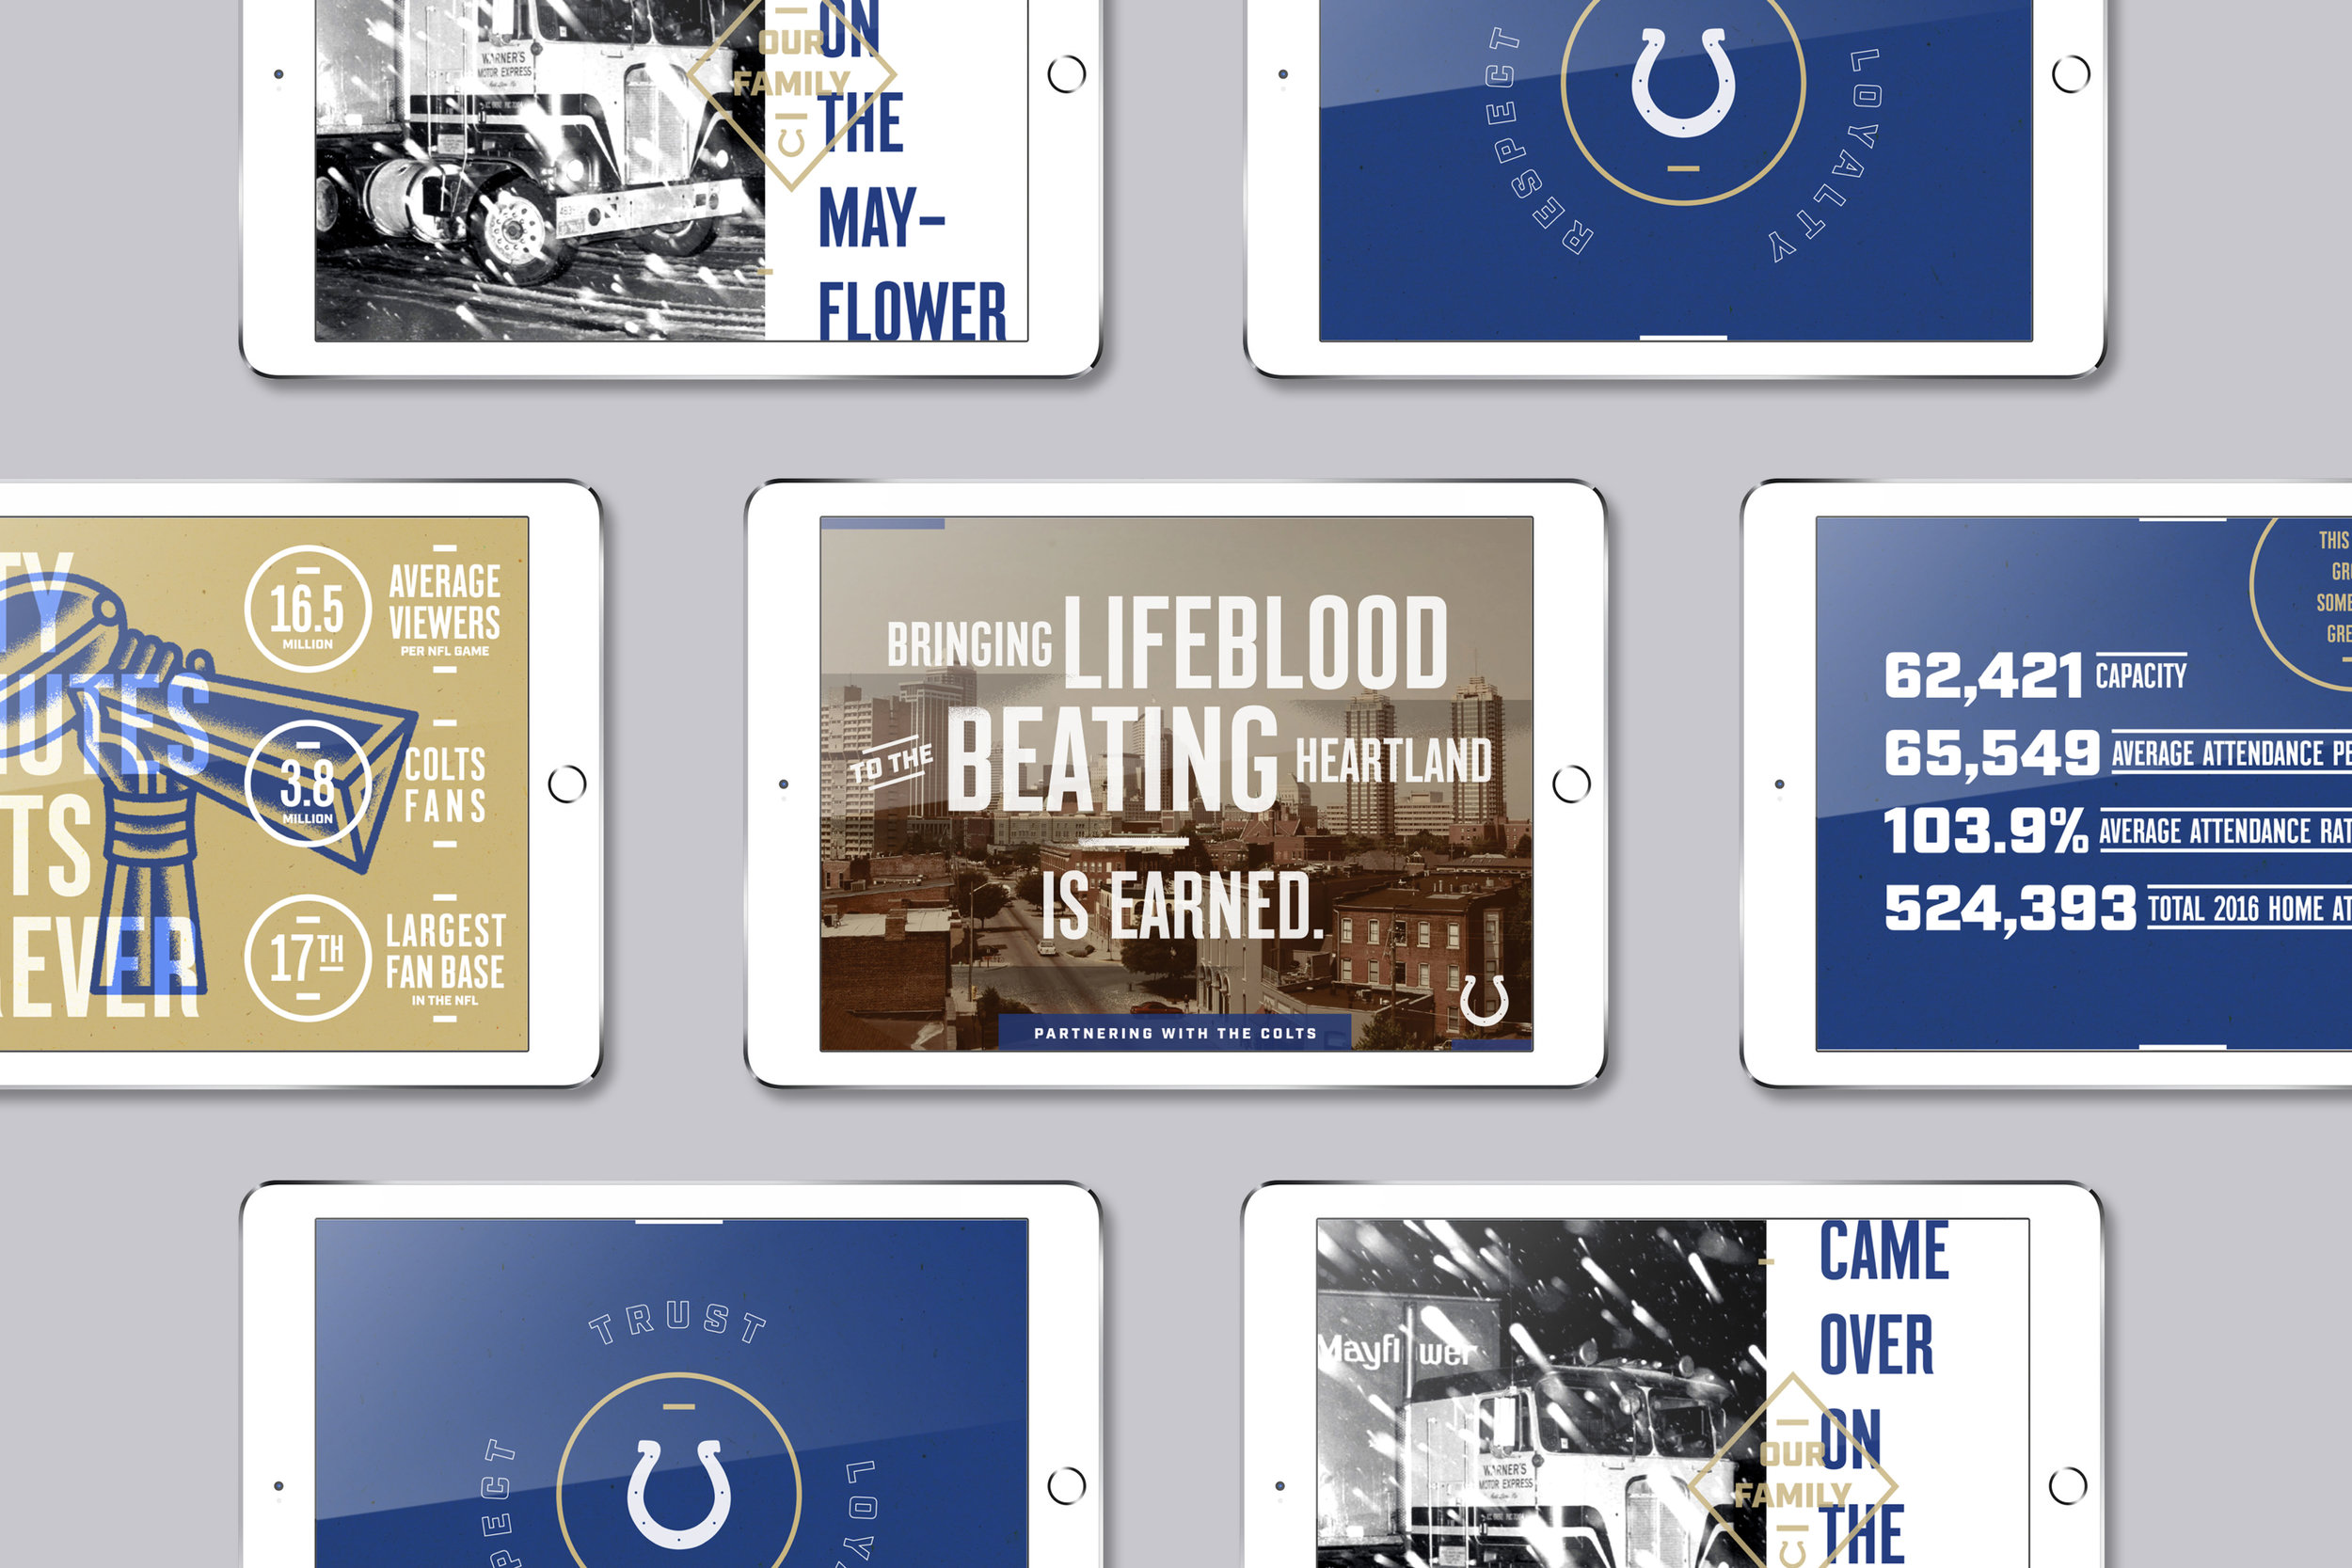 Colts_3.jpg